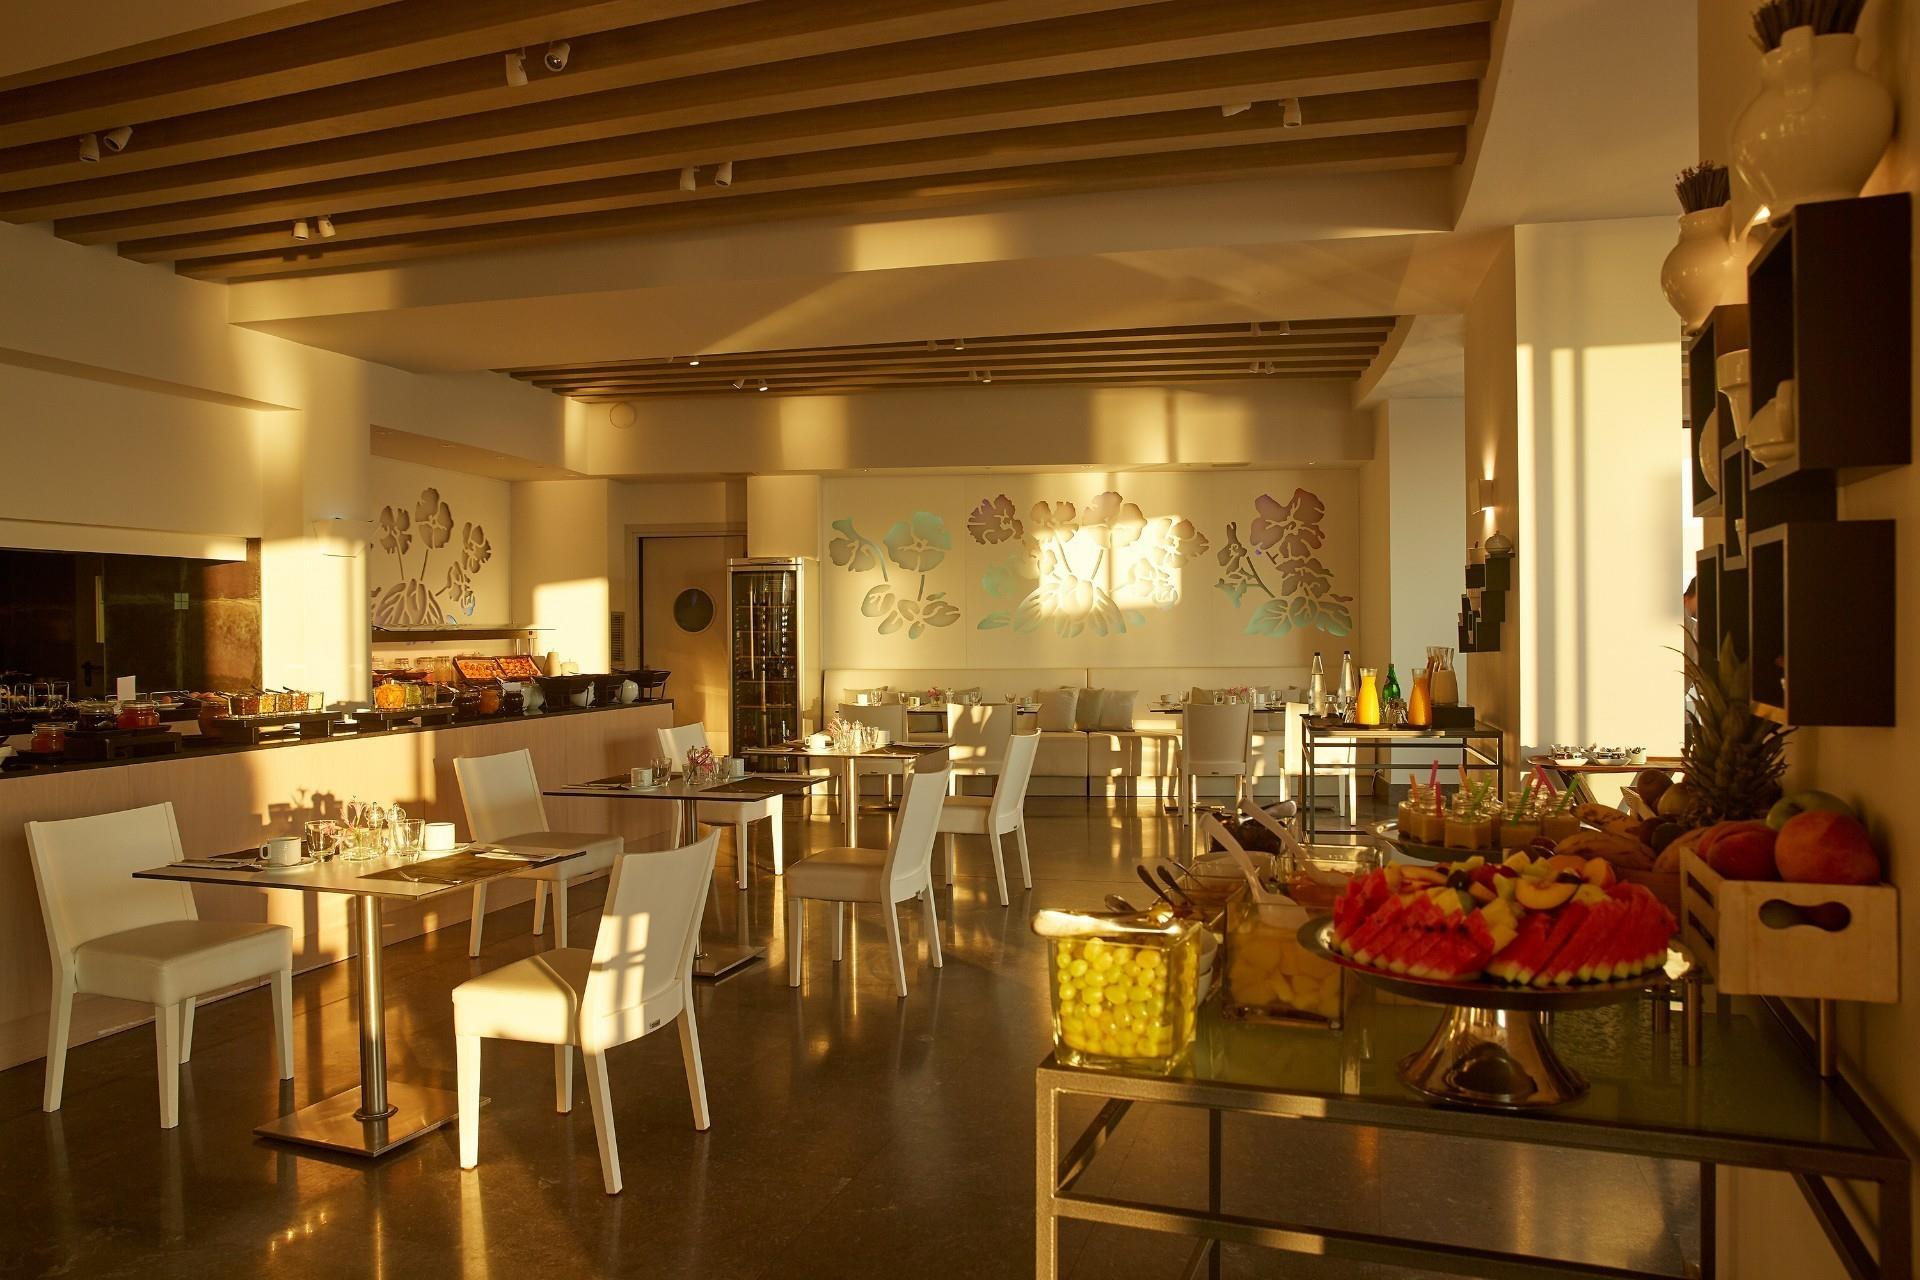 cavo-olympo-luxury-hotel-spa-genel-0015